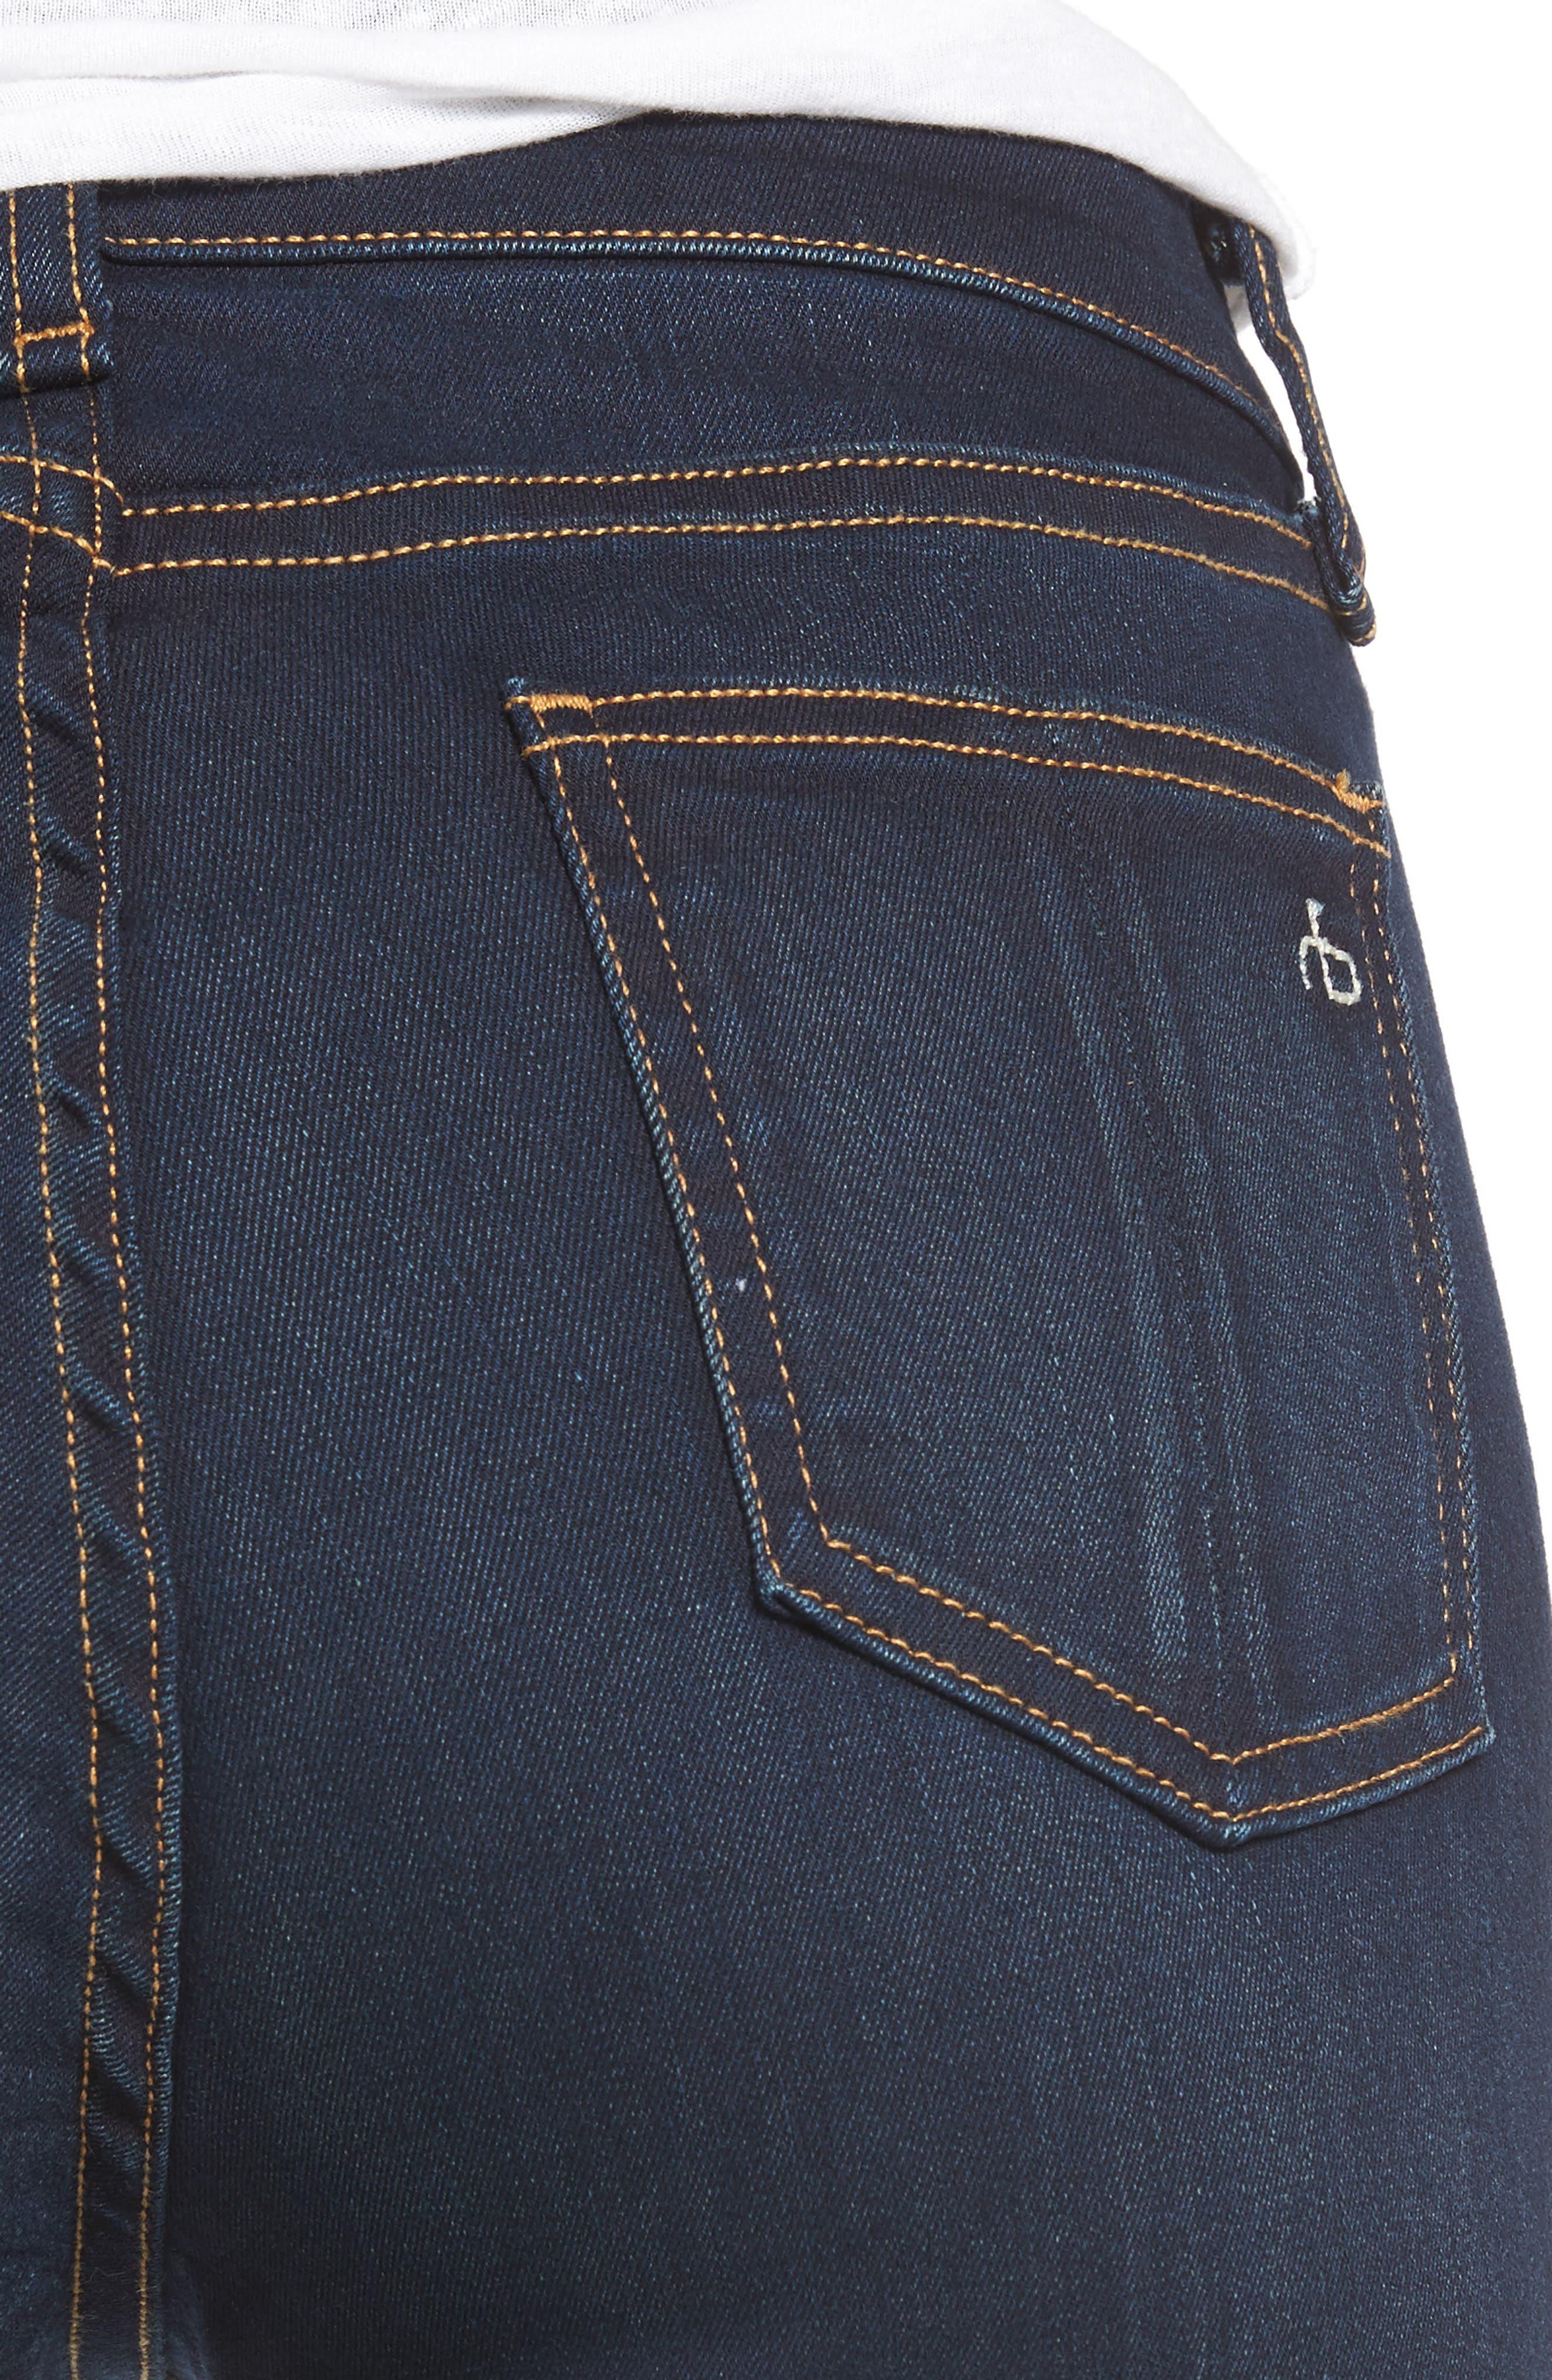 Alternate Image 4  - rag & bone DENIM High Waist Skinny Jeans (Bedford)